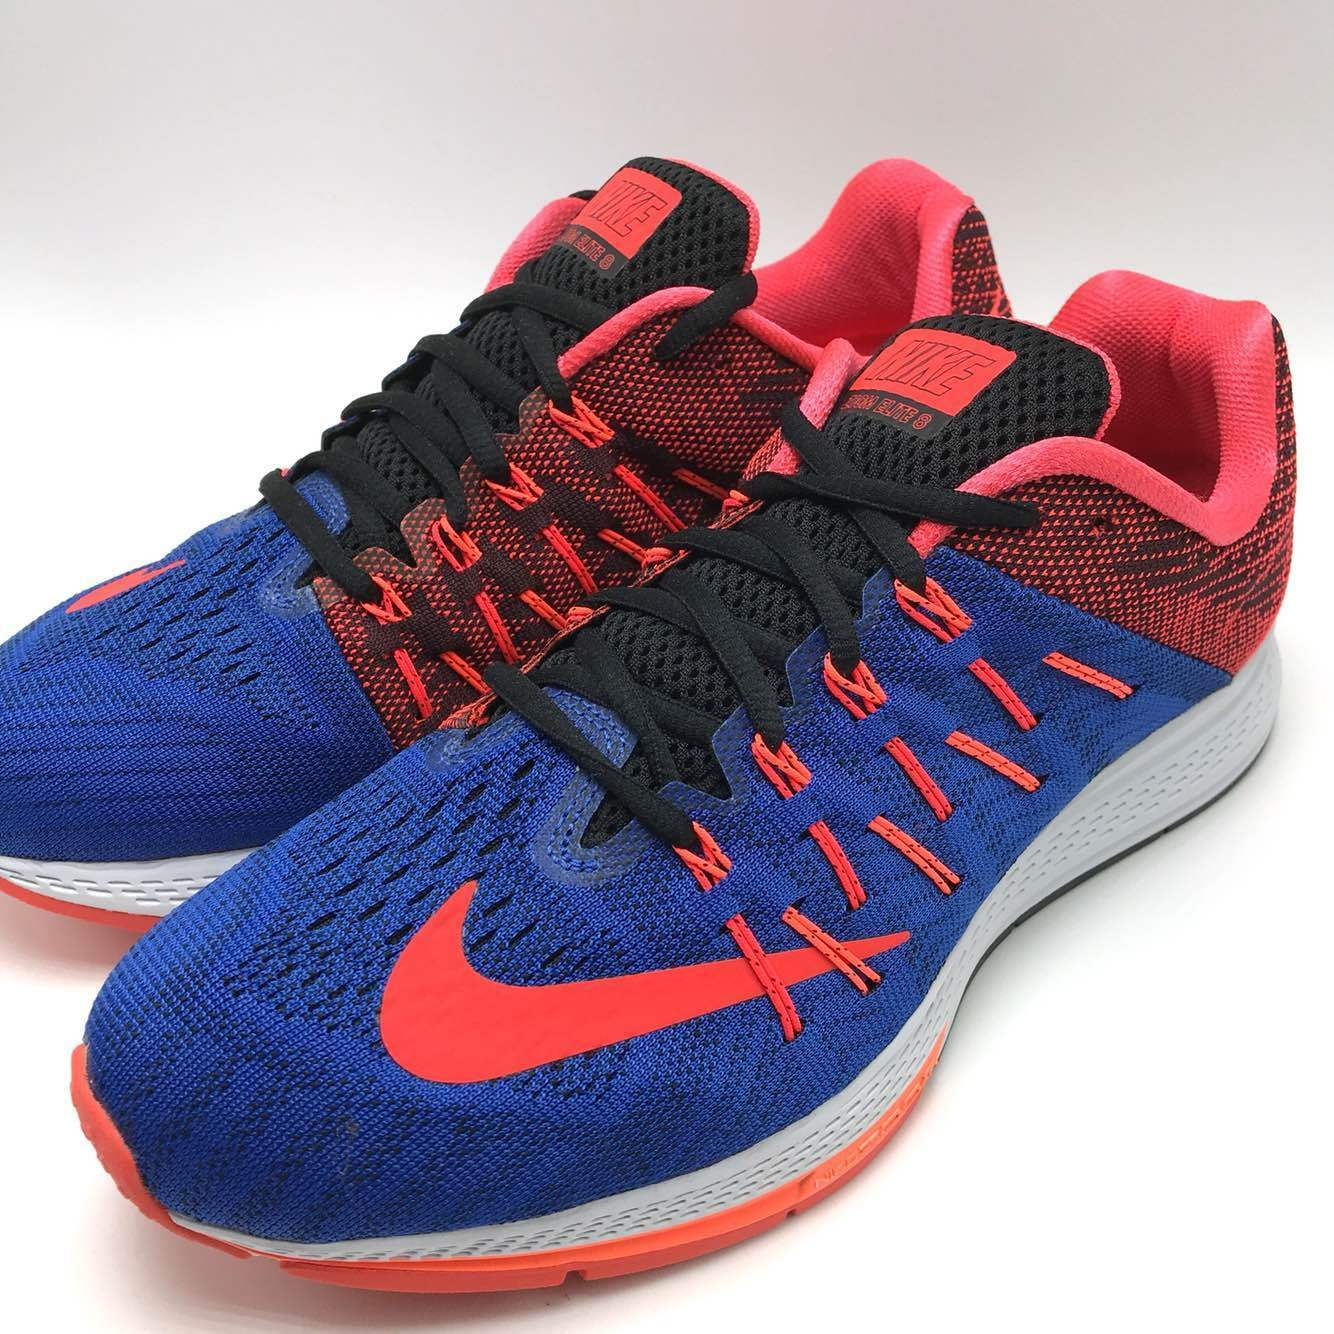 cheap for discount 63d61 2f124 Nike Air Zoom Elite 8 8 8 Blue Crimson Black Men s Running Trainer Shoes  748588-400 58a3a3